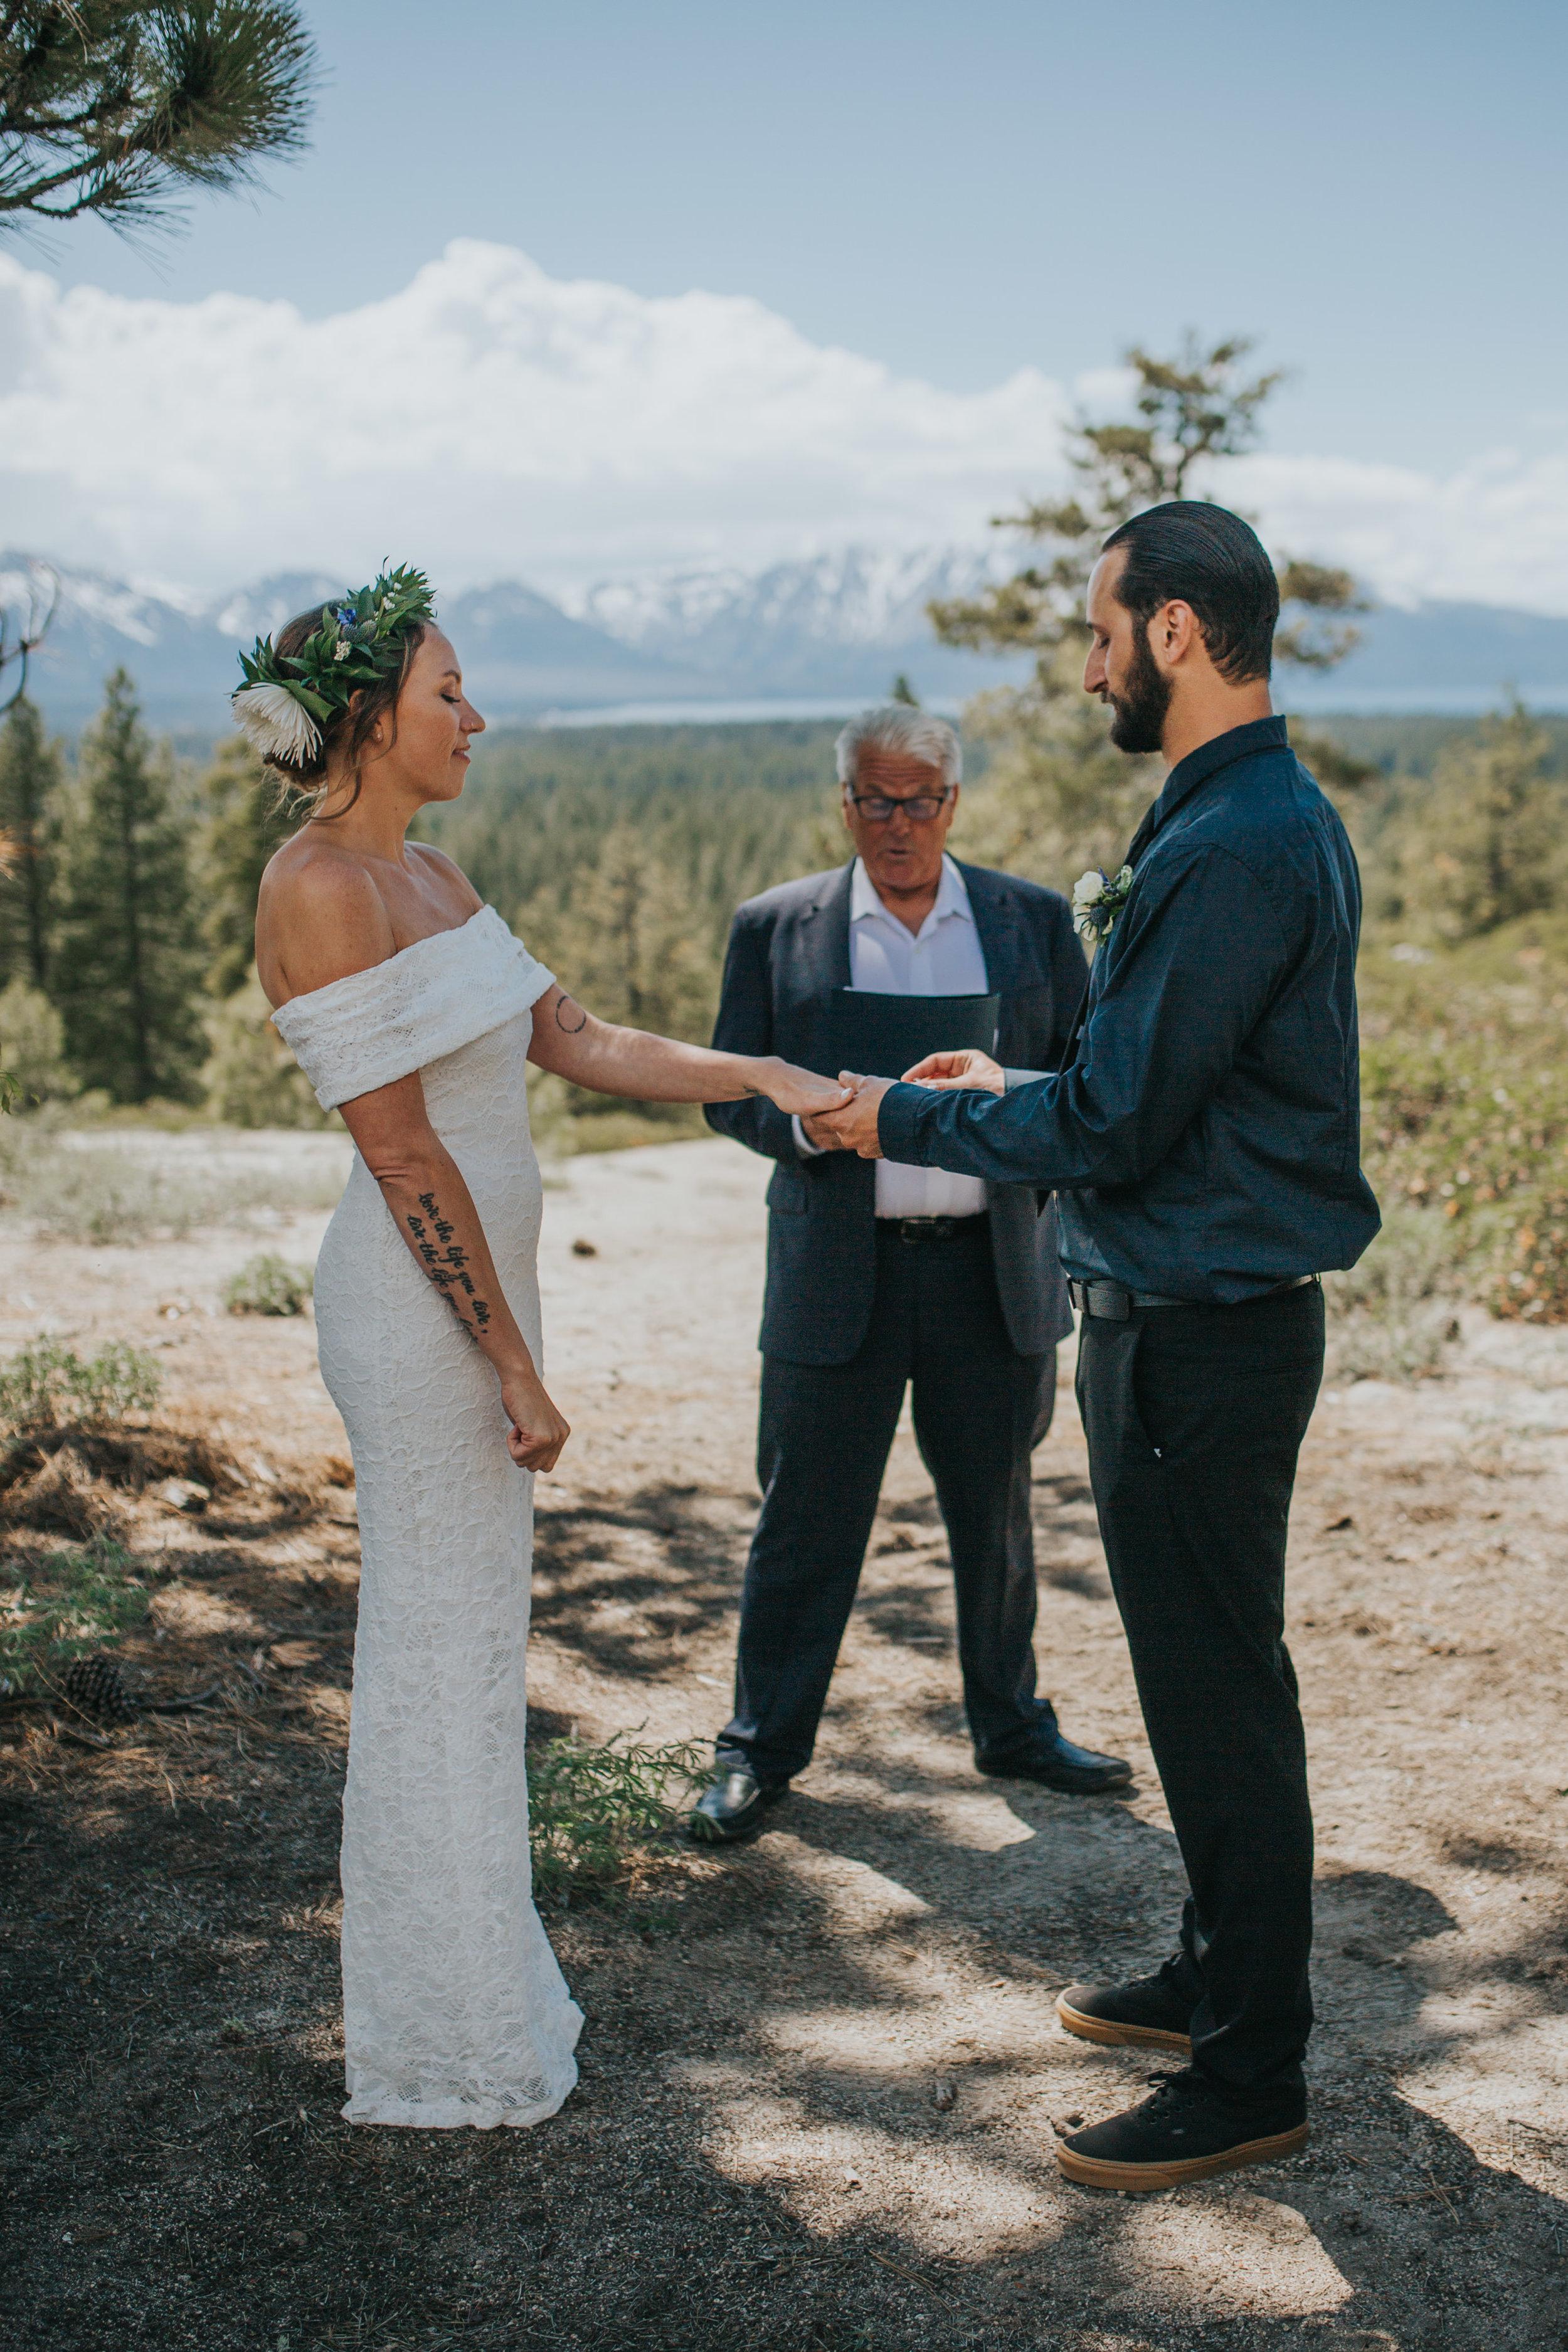 south-lake-tahoe-elopement-valerie-lendvay-photo-030.jpg